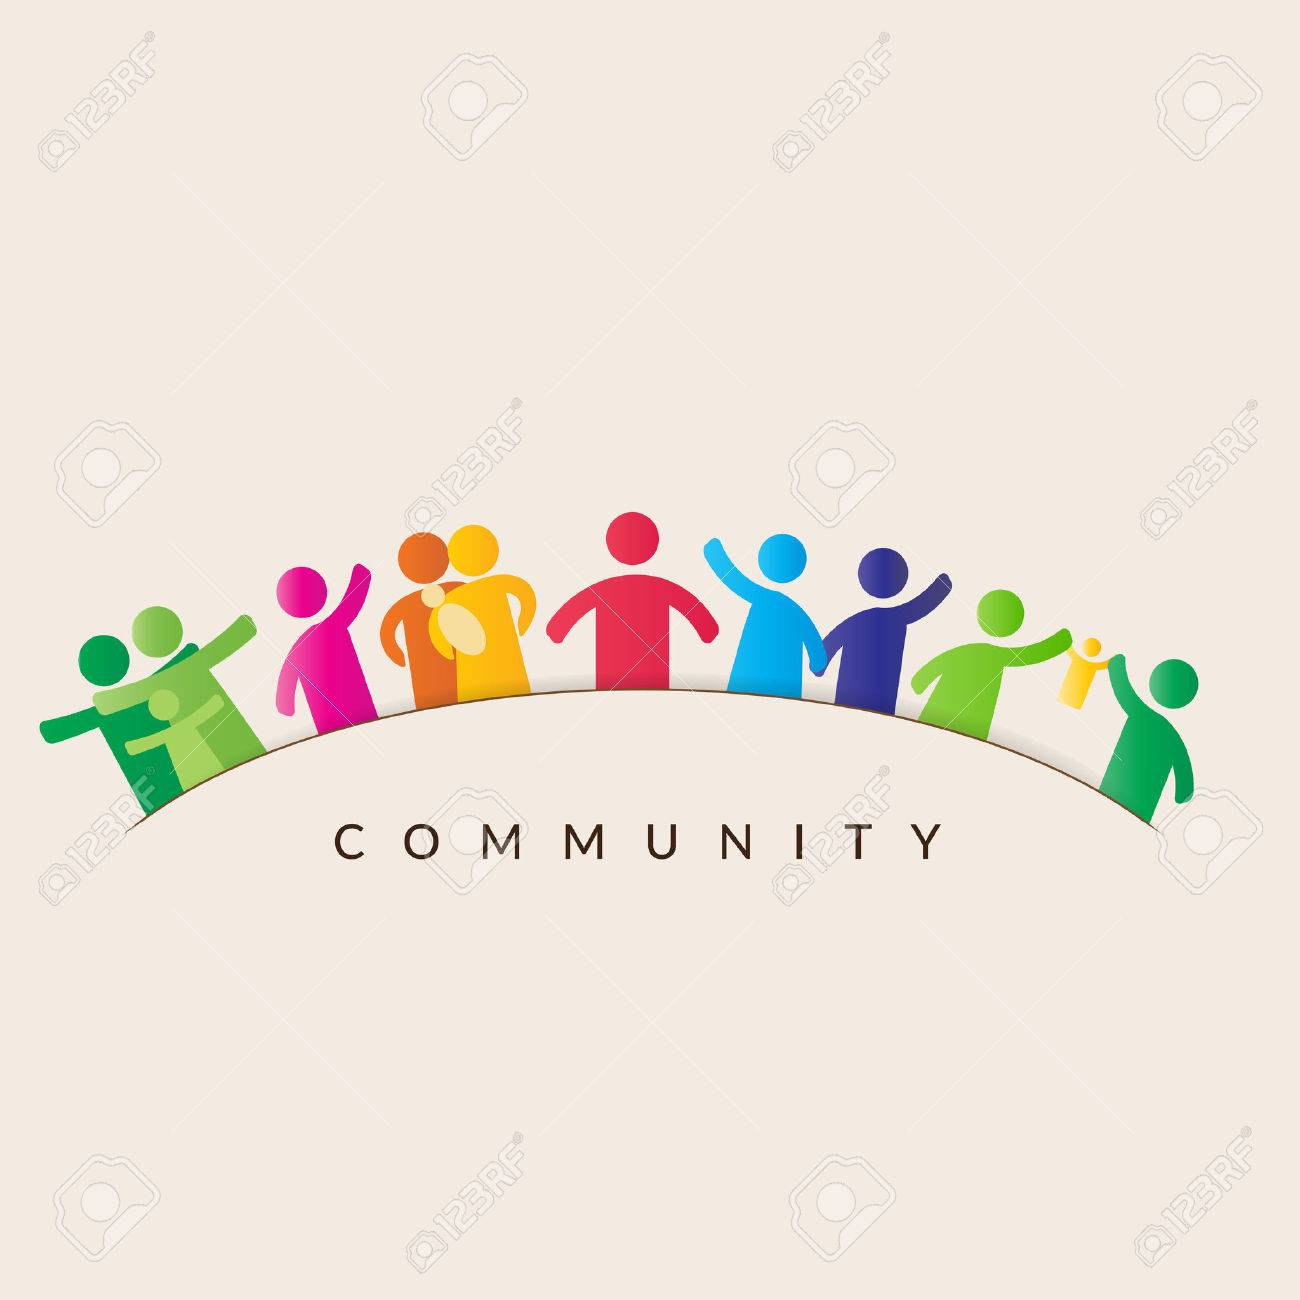 Community concept - pictogram showing figures happy family - 69824278